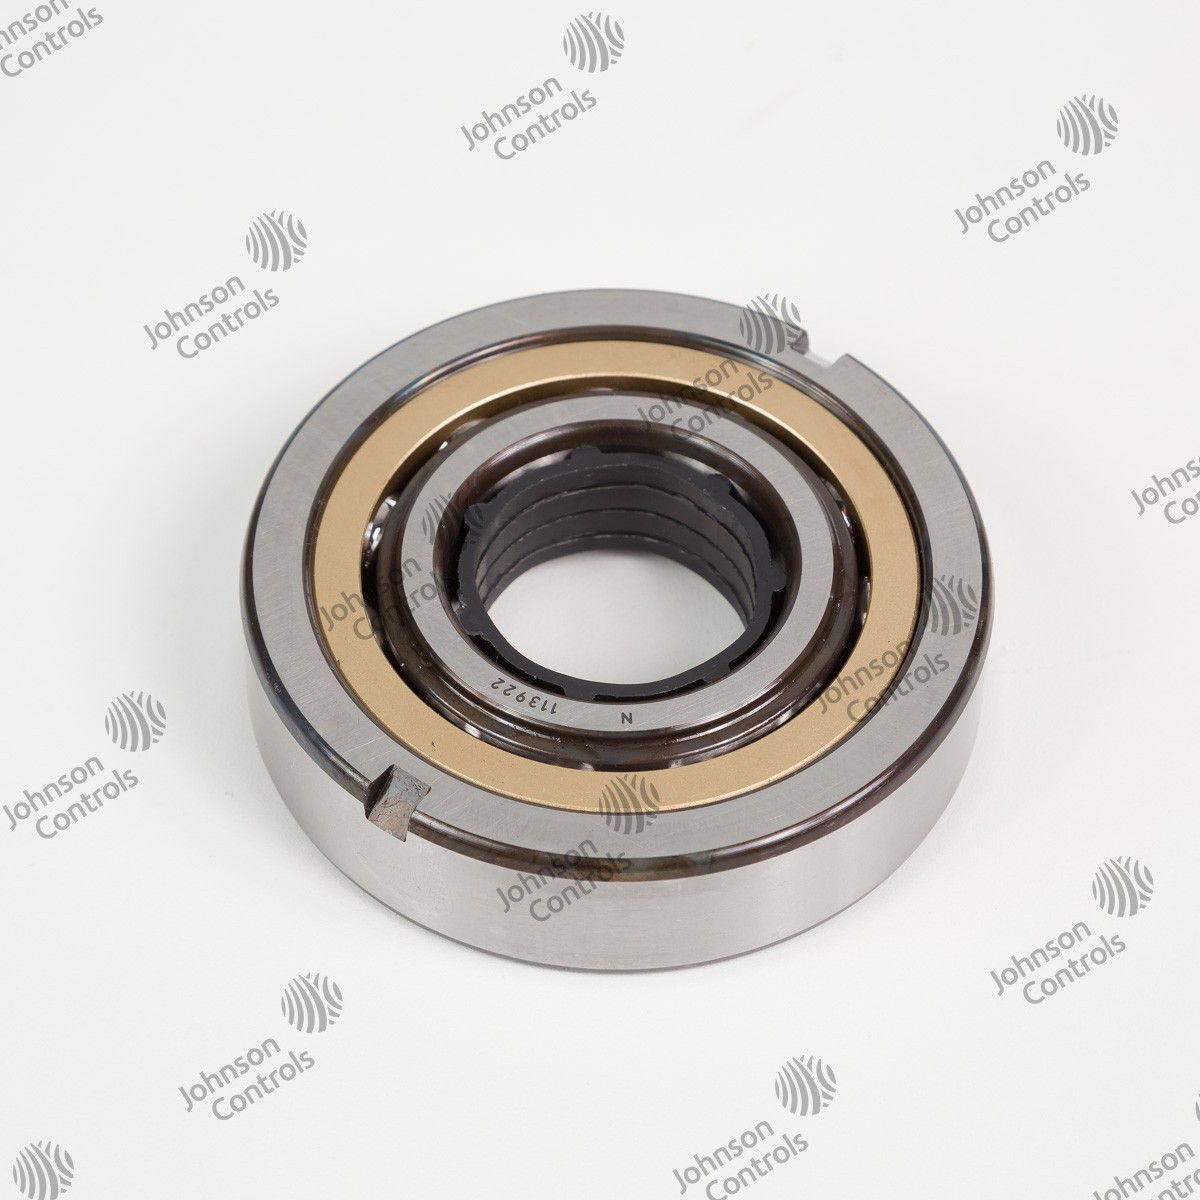 ROLAM ESF 4 PT CONT SAB128 MK2 - 1513+028